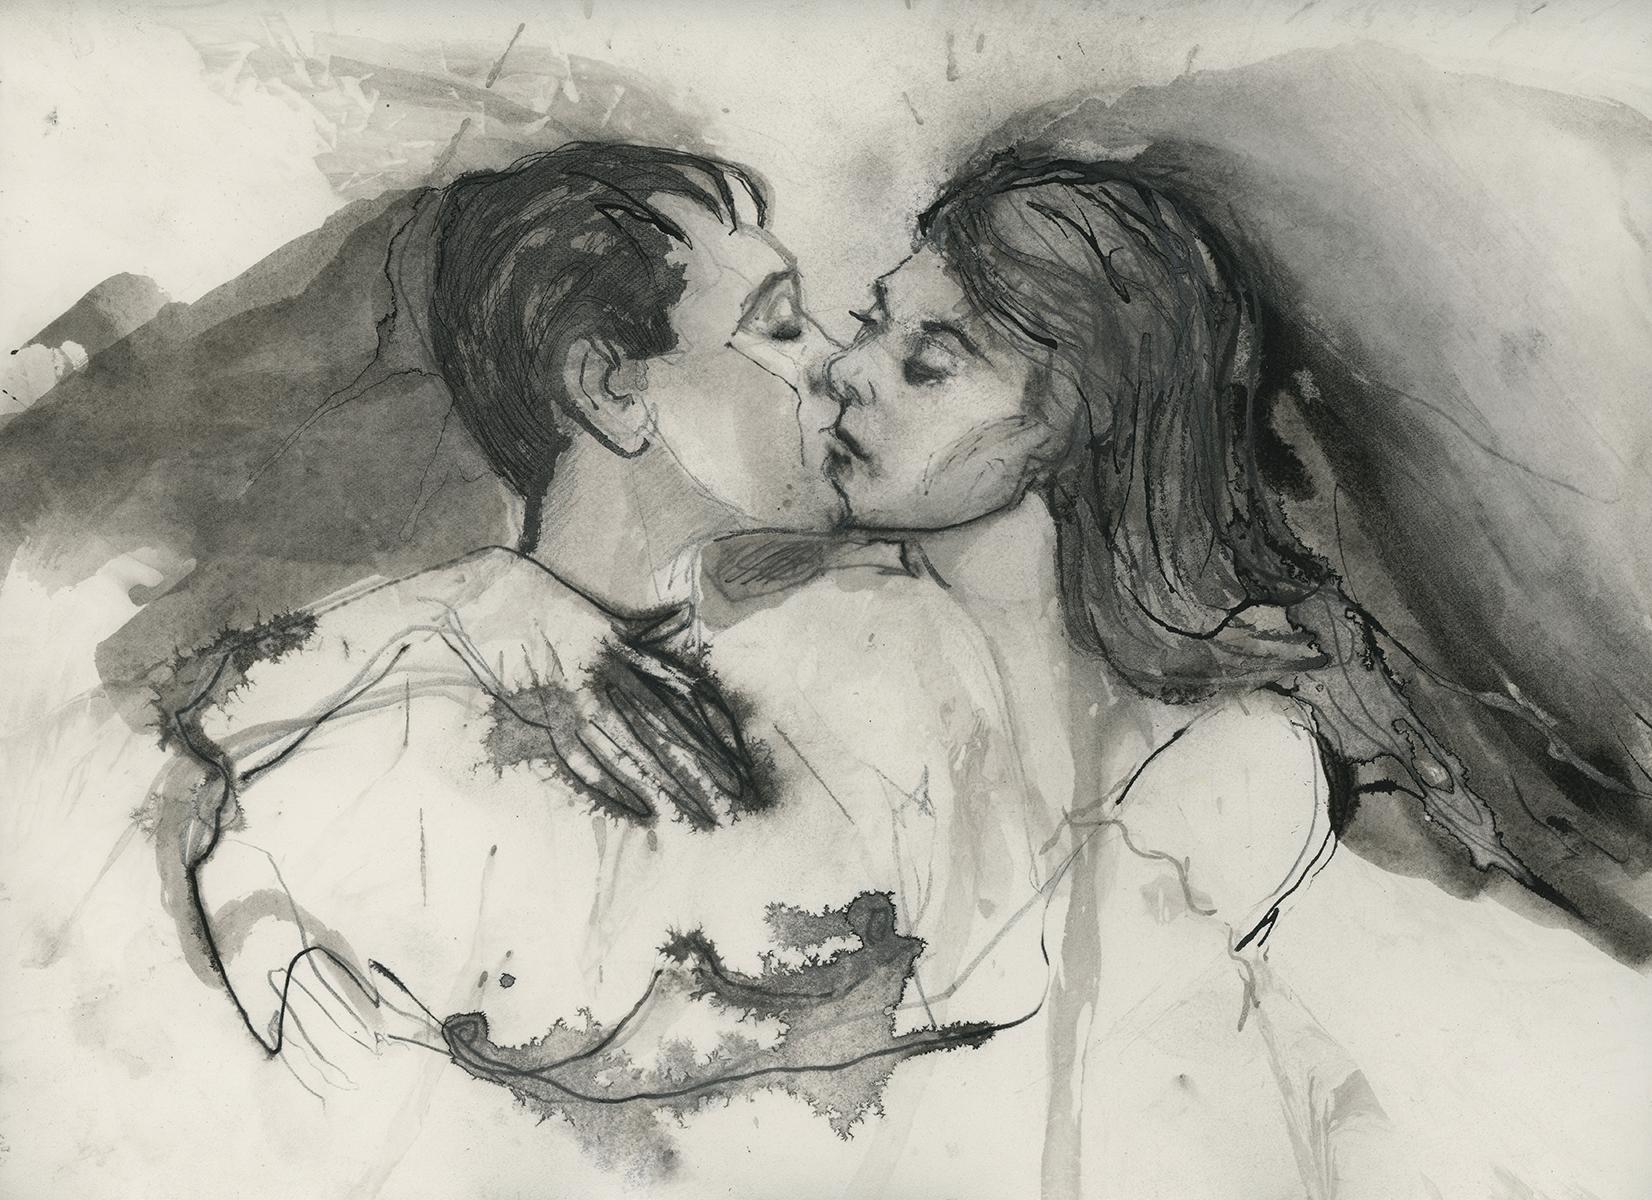 Kiss (11 x 14 inches)